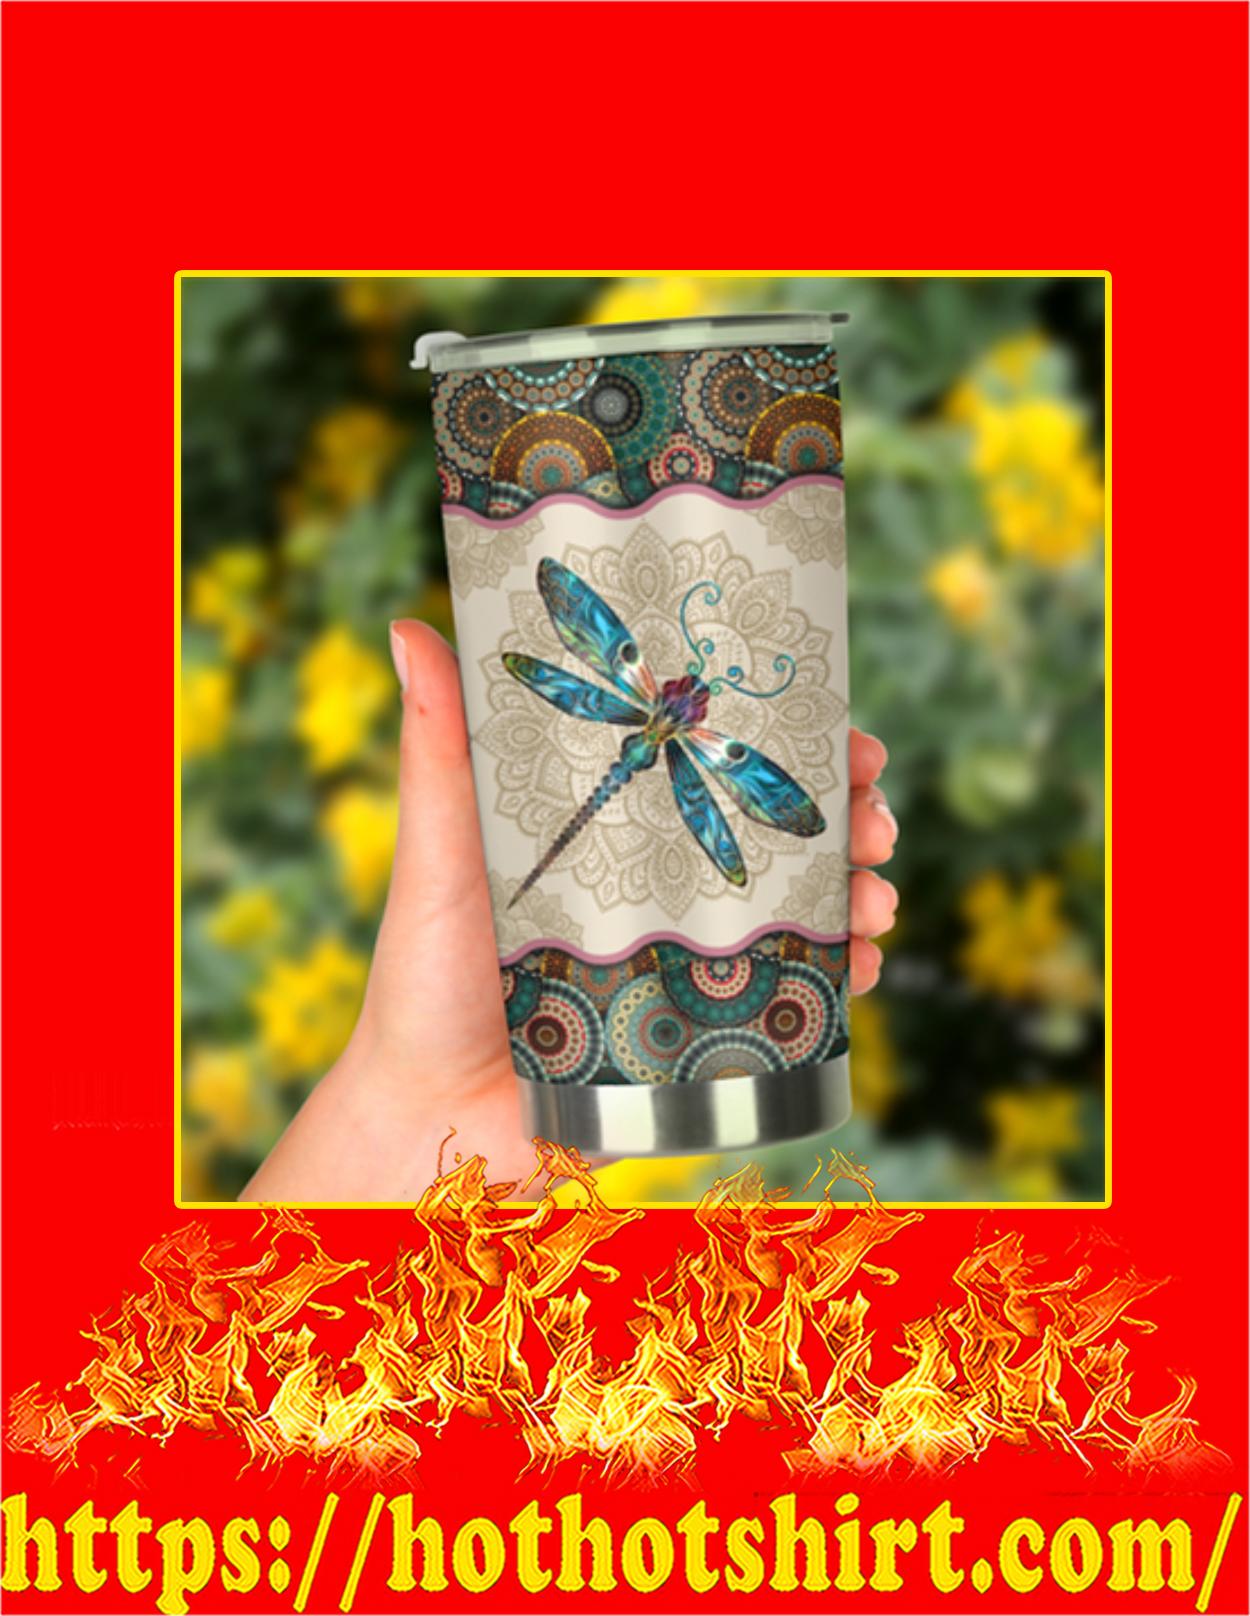 Dragonfly vintage mandala tumbler - Pic 2